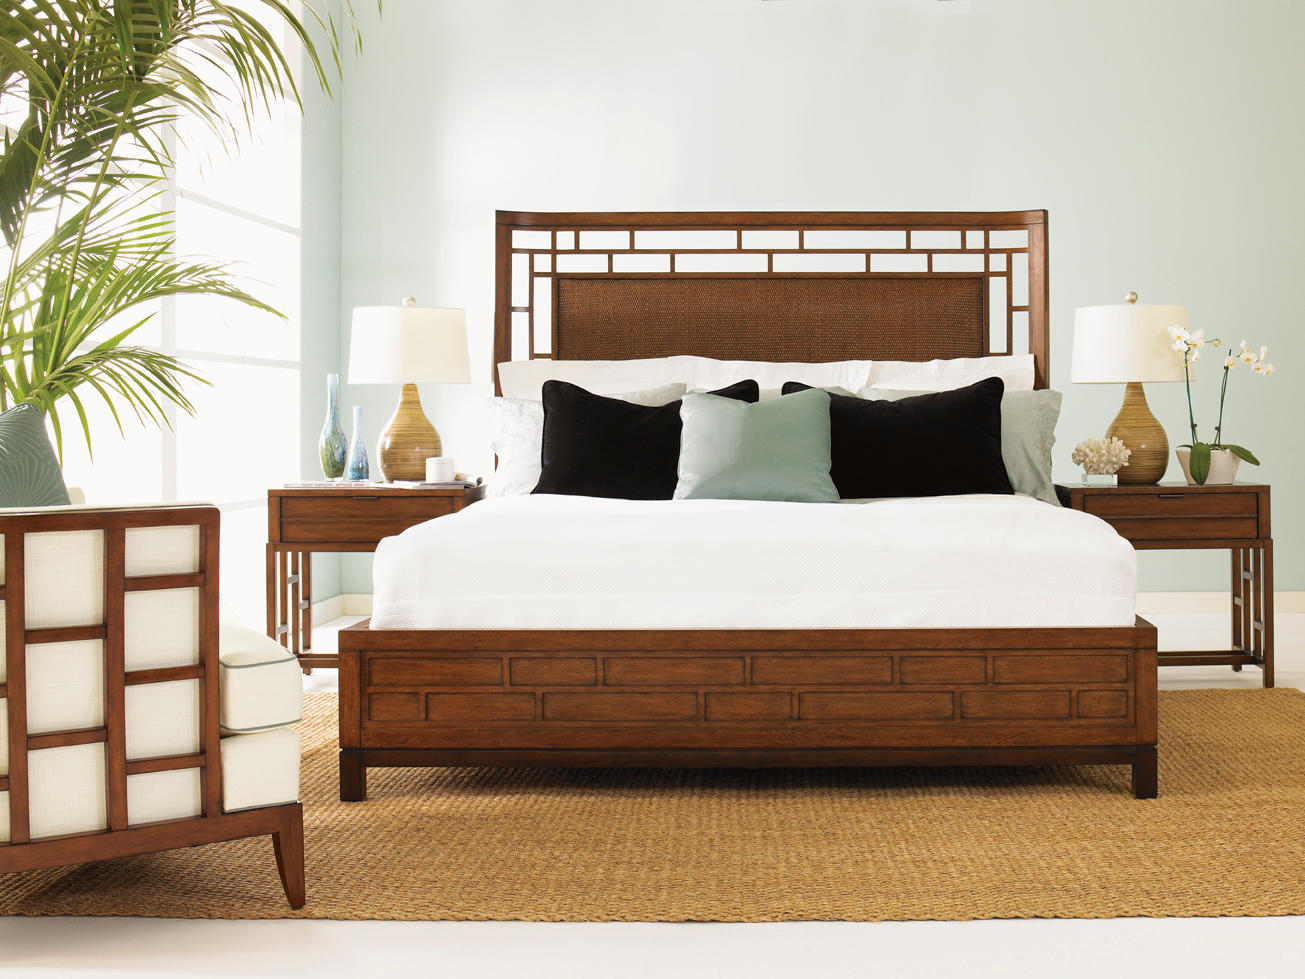 Fedde Furniture 2350 E Colorado Blvd Pasadena, CA Home Improvements    MapQuest